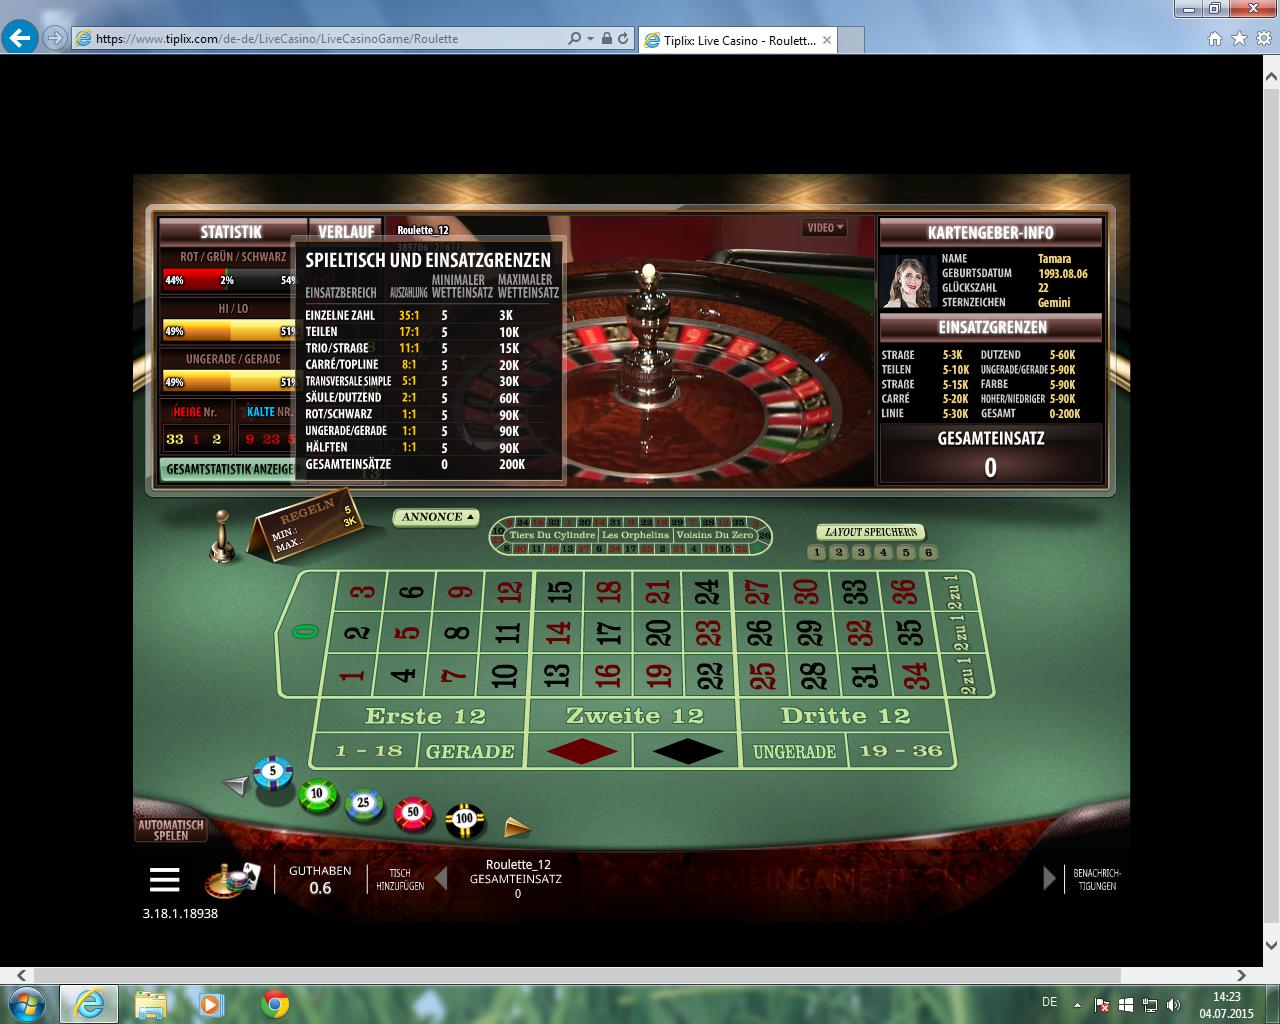 tiplix casino